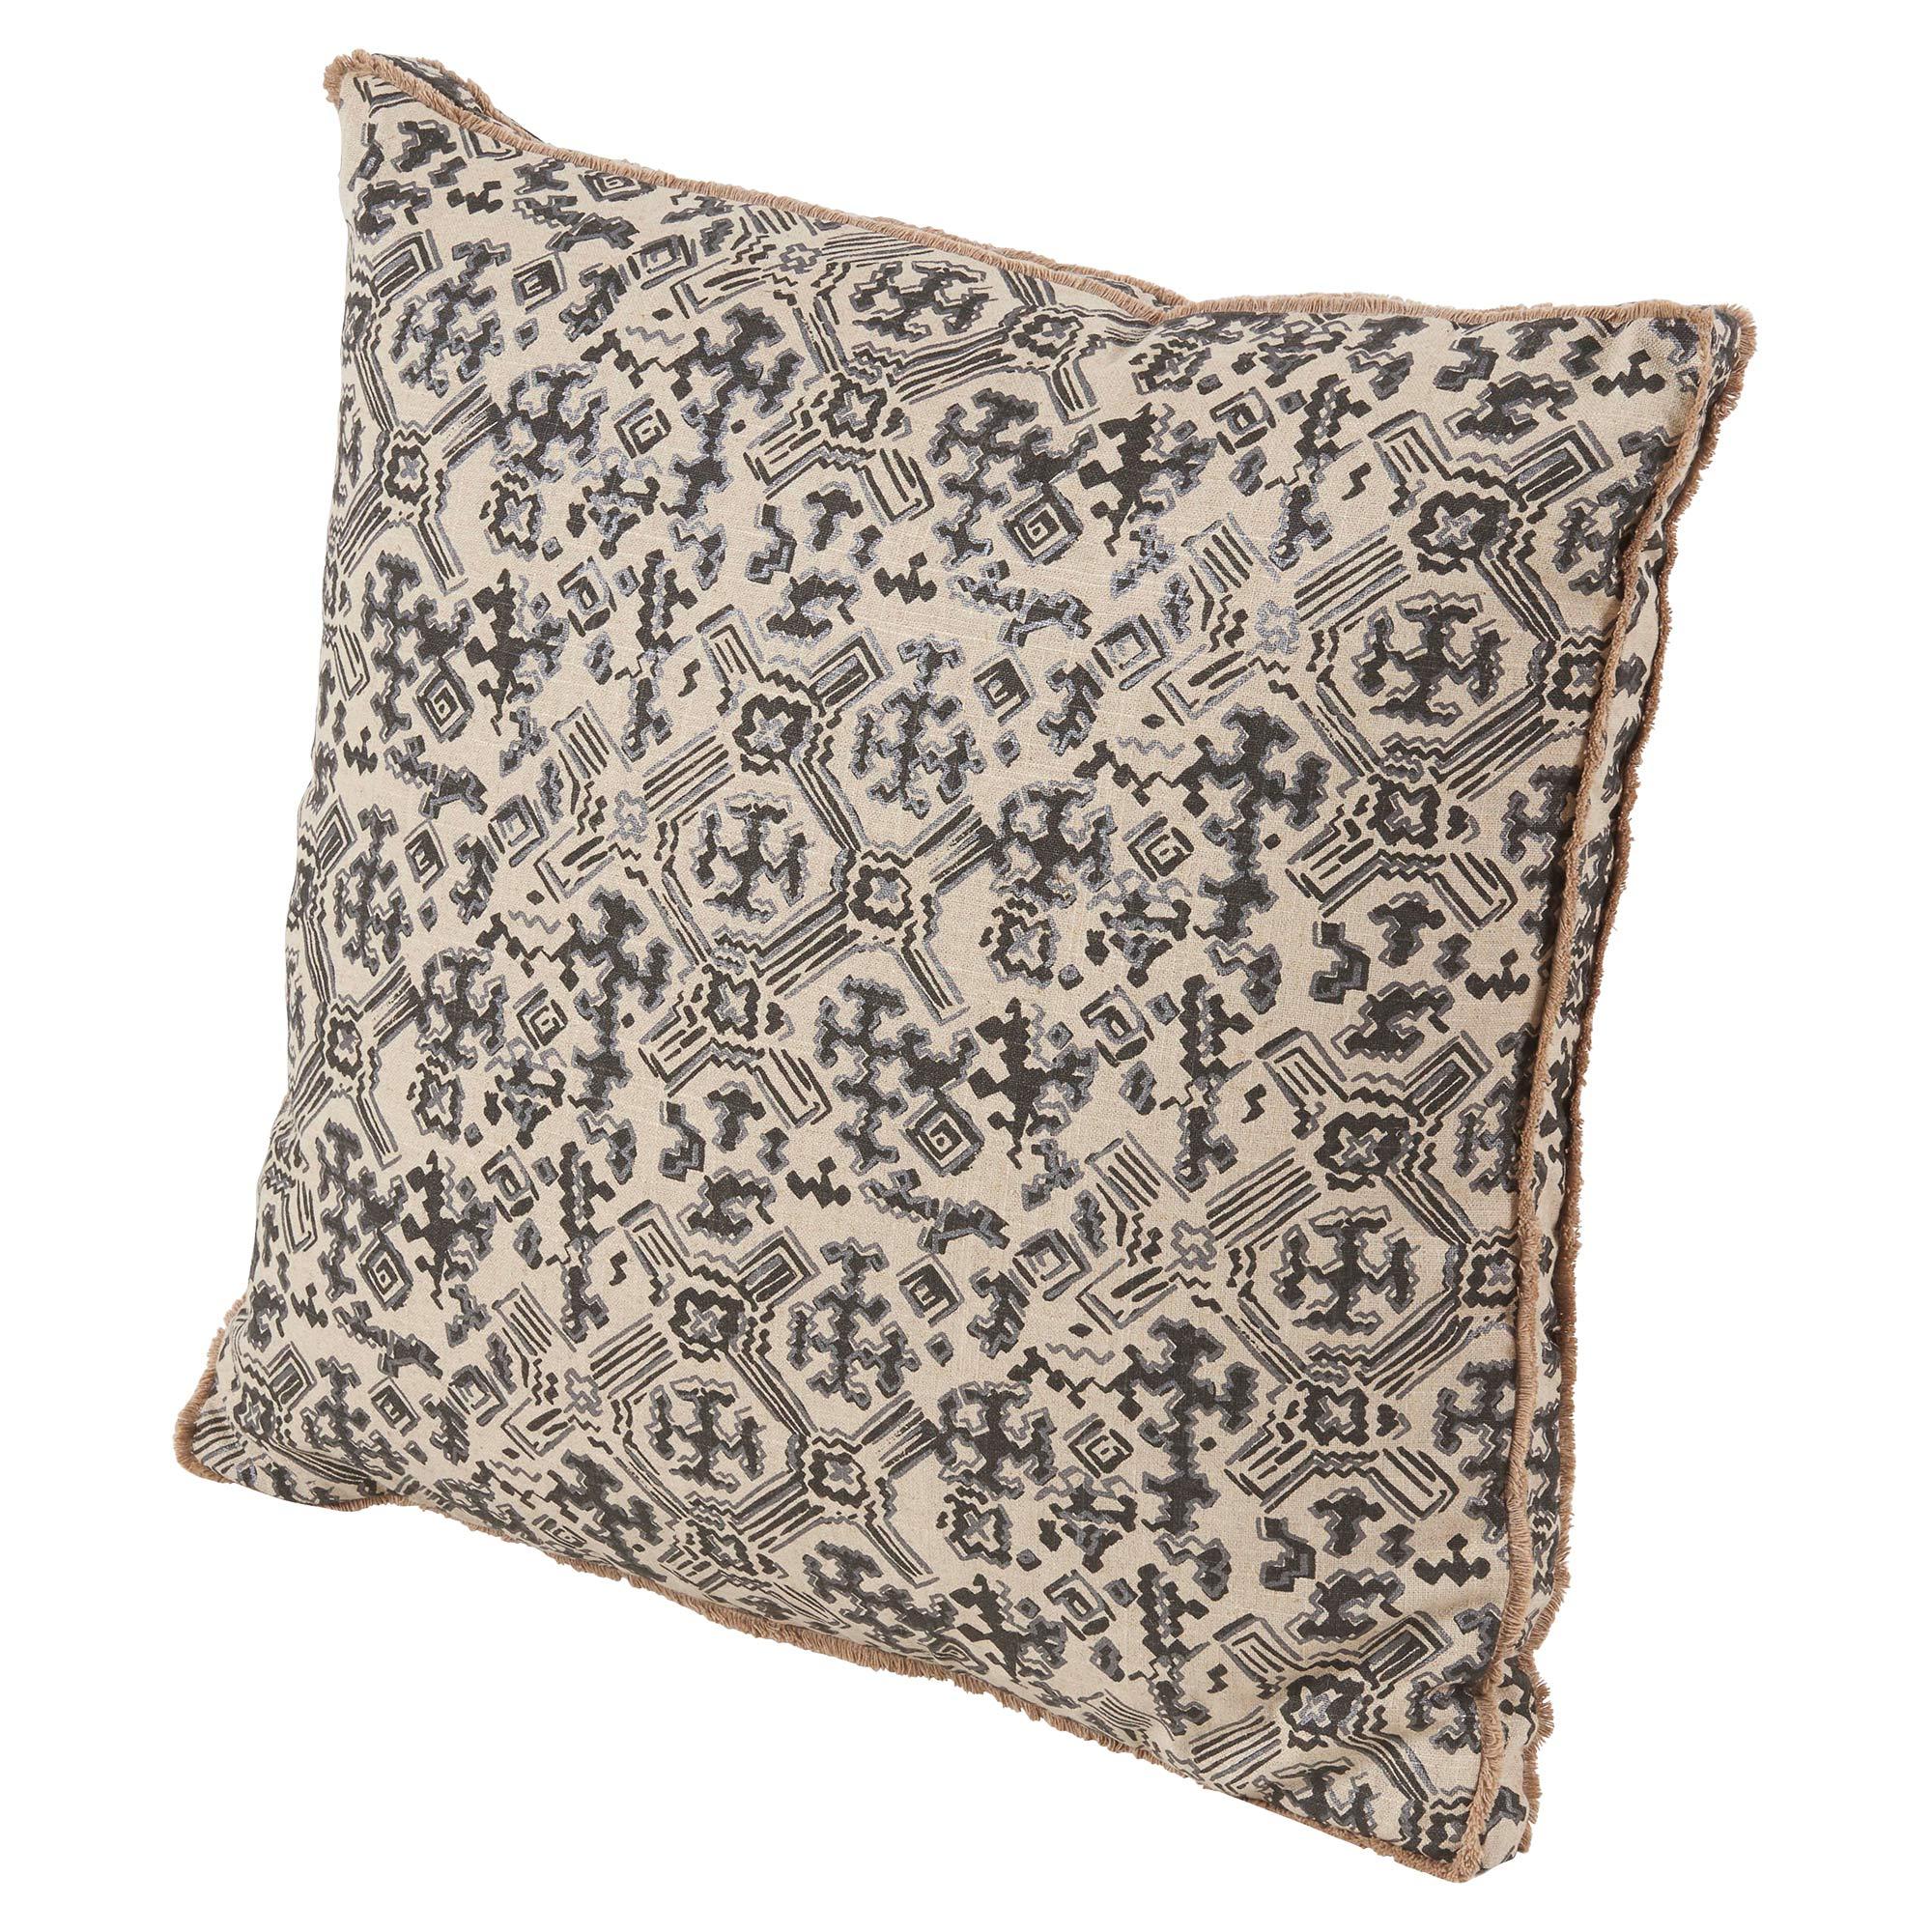 Noma Bazaar Grey Granite Tribal Print Eyelash Pillow - 22x22